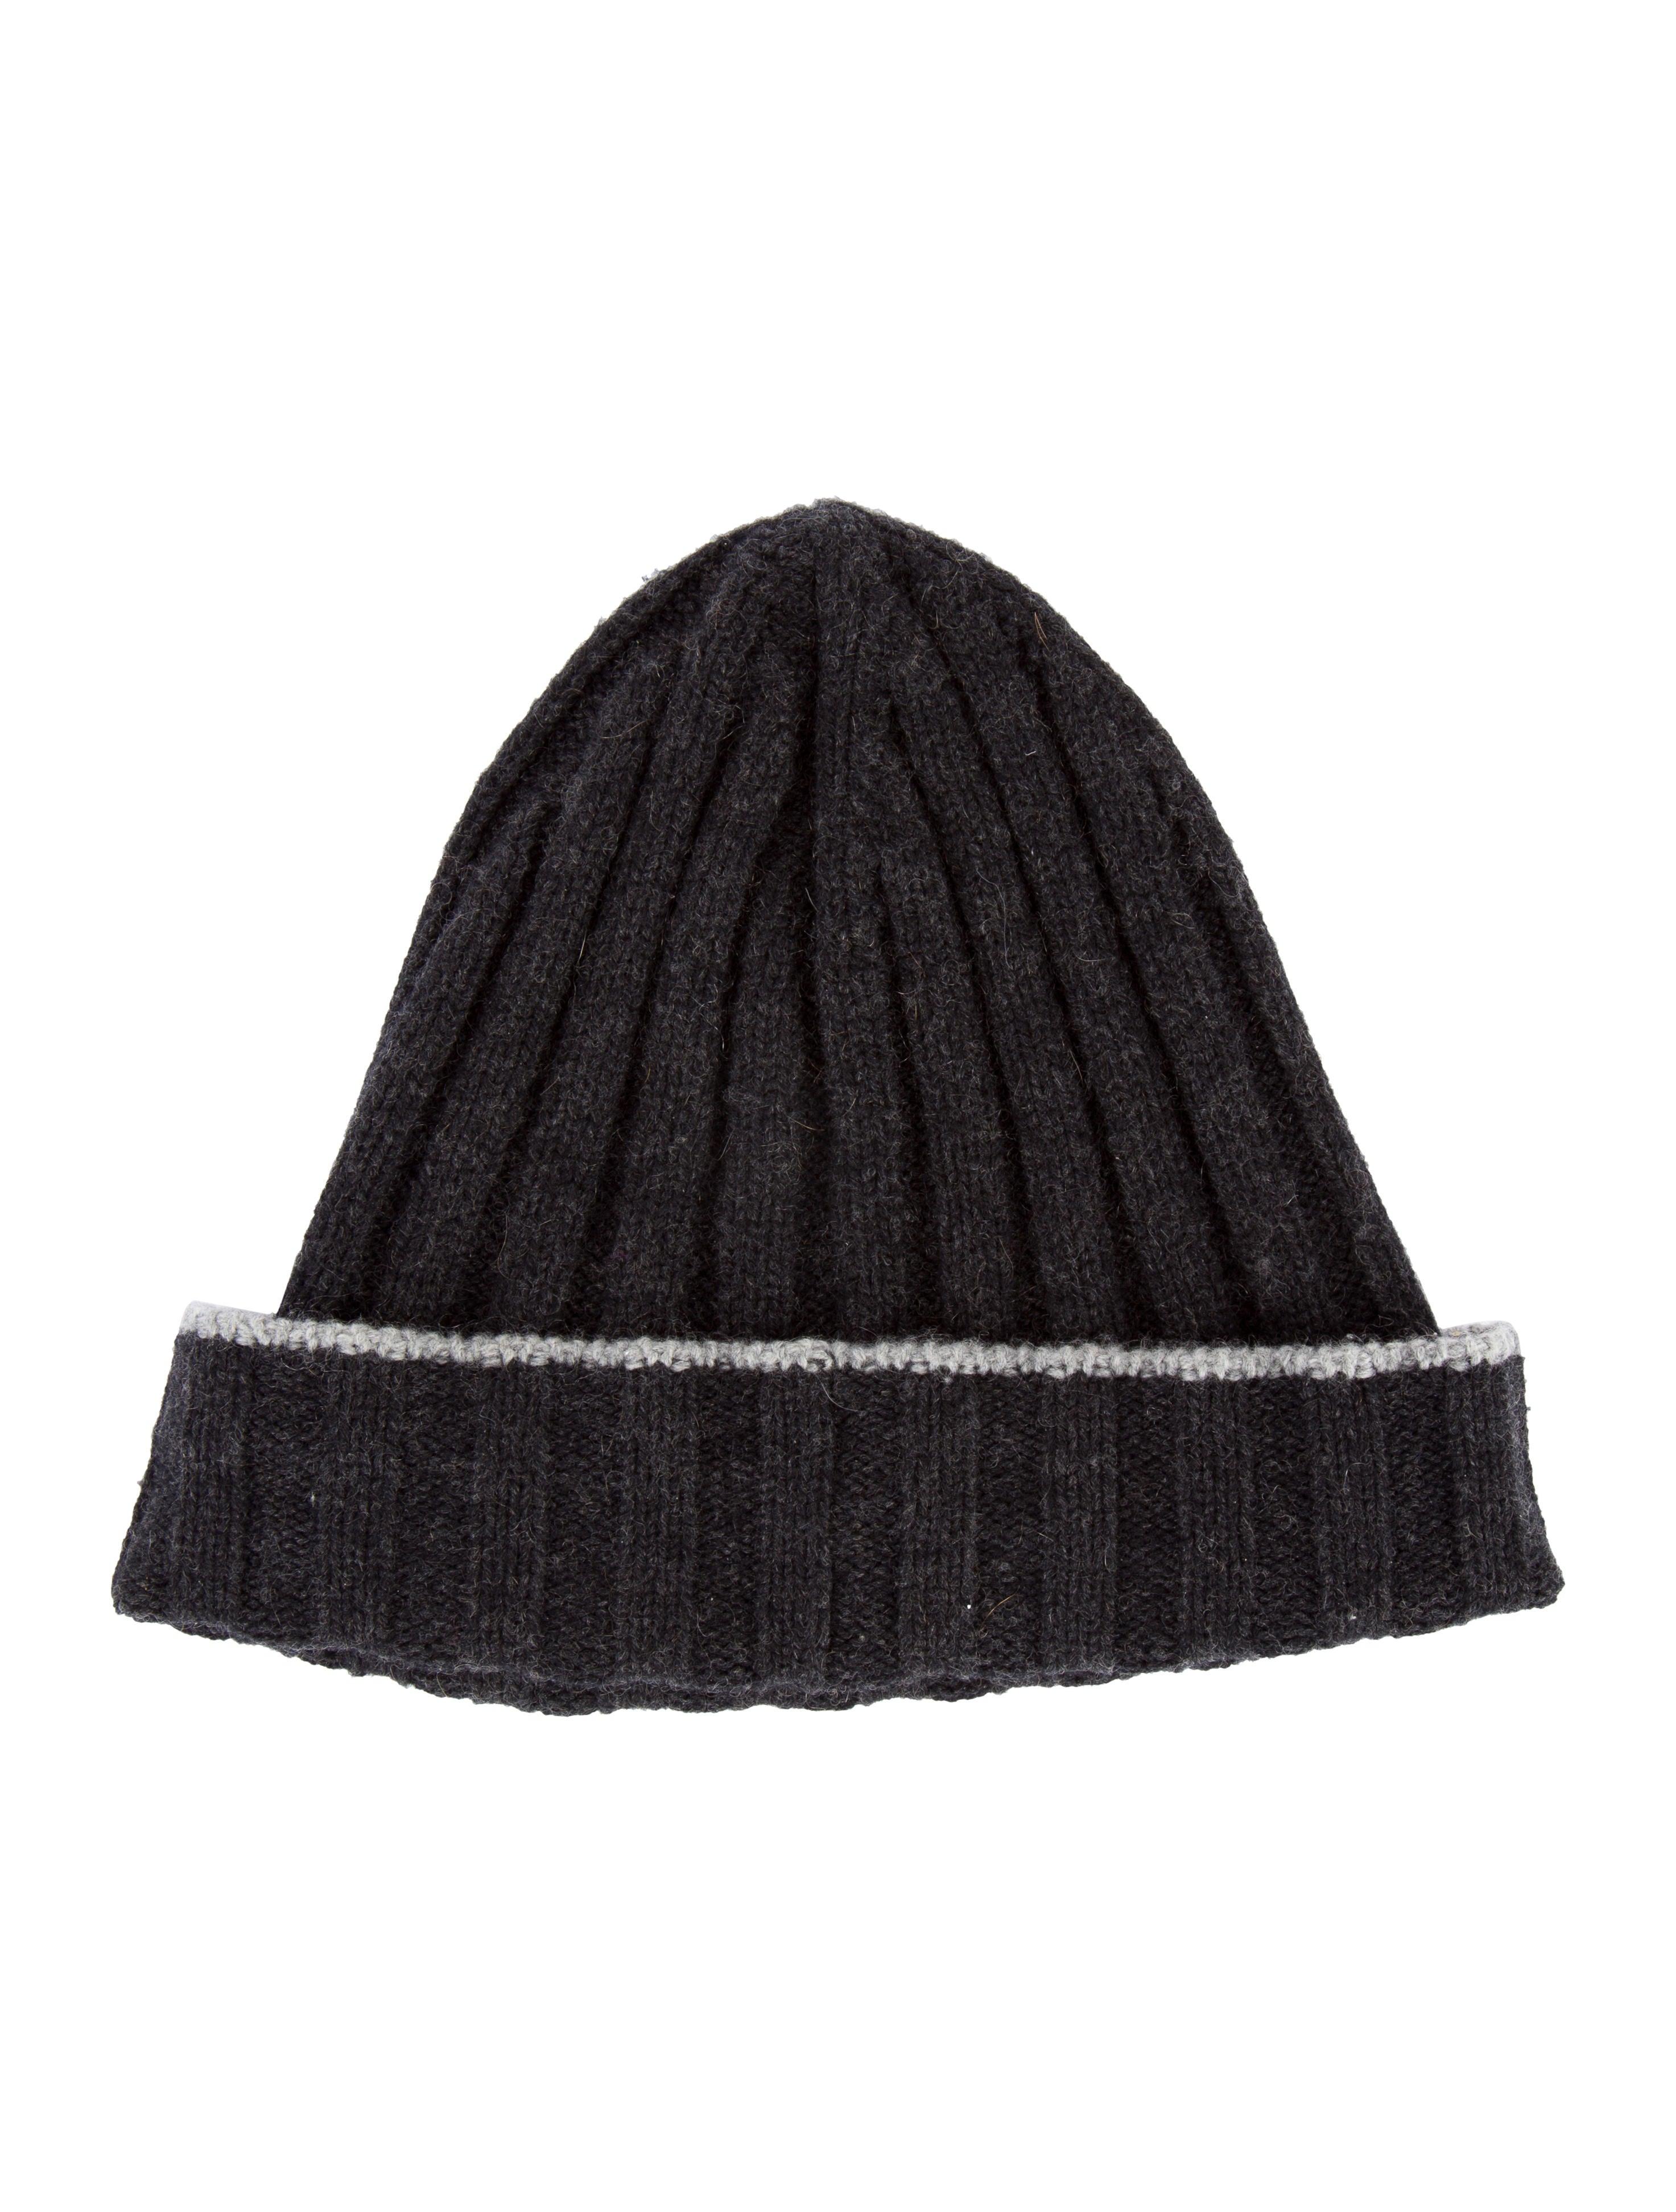 Knitting Pattern For Cashmere Beanie : Brunello Cucinelli Cashmere Rib Knit Beanie - Accessories ...